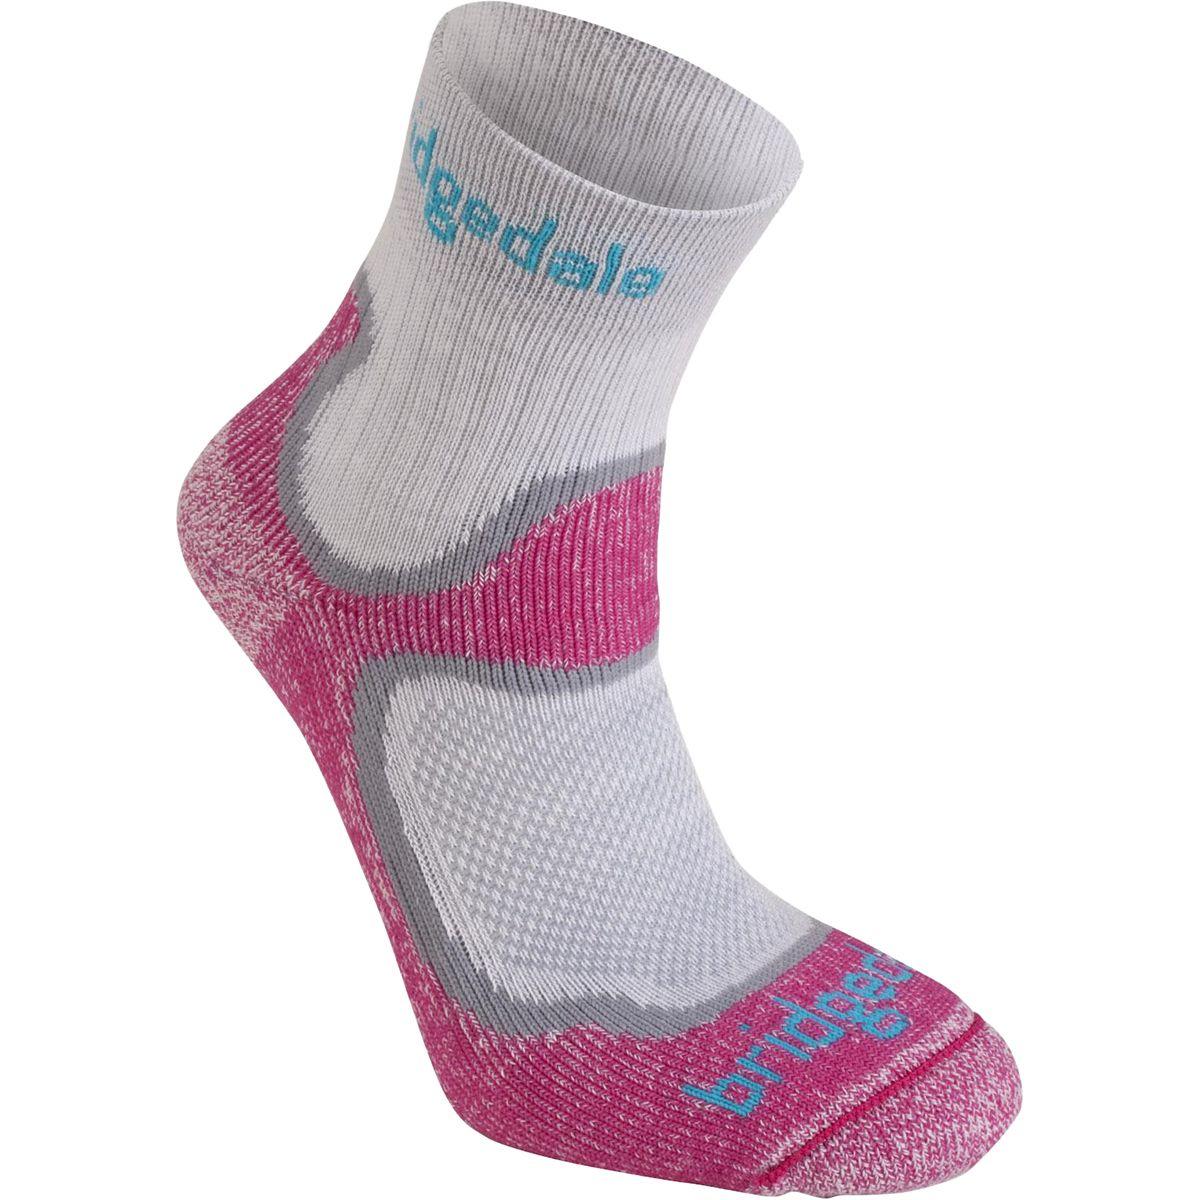 Bridgedale Hike Lightweight Ankle Merino Performance